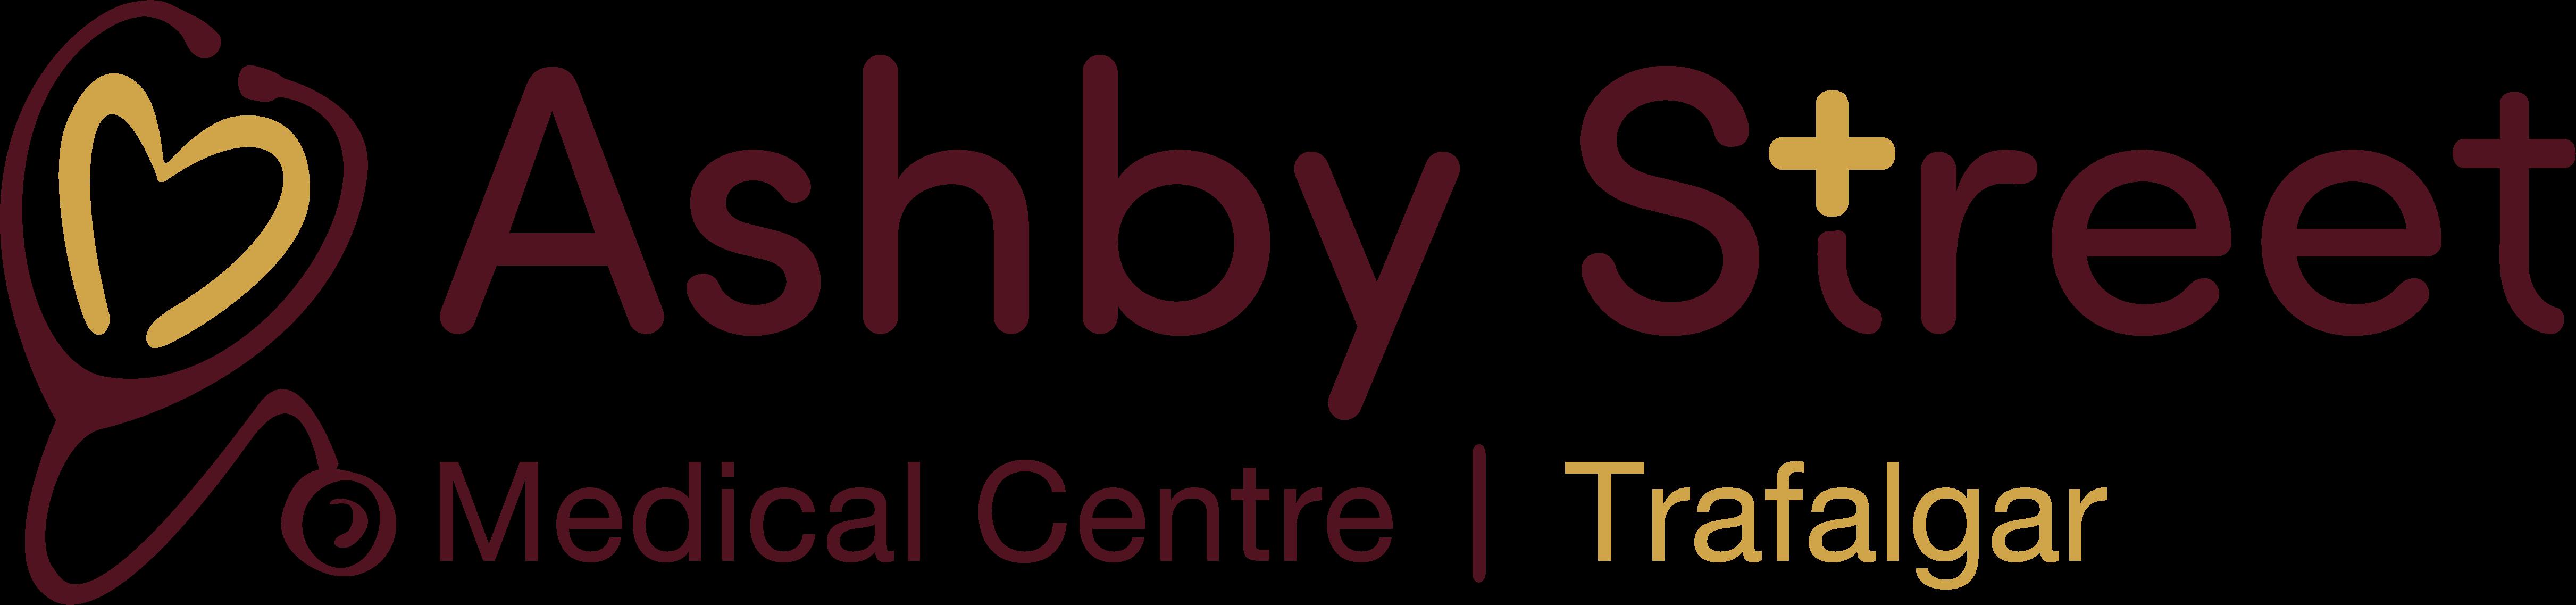 Ashby Street Medical Centre